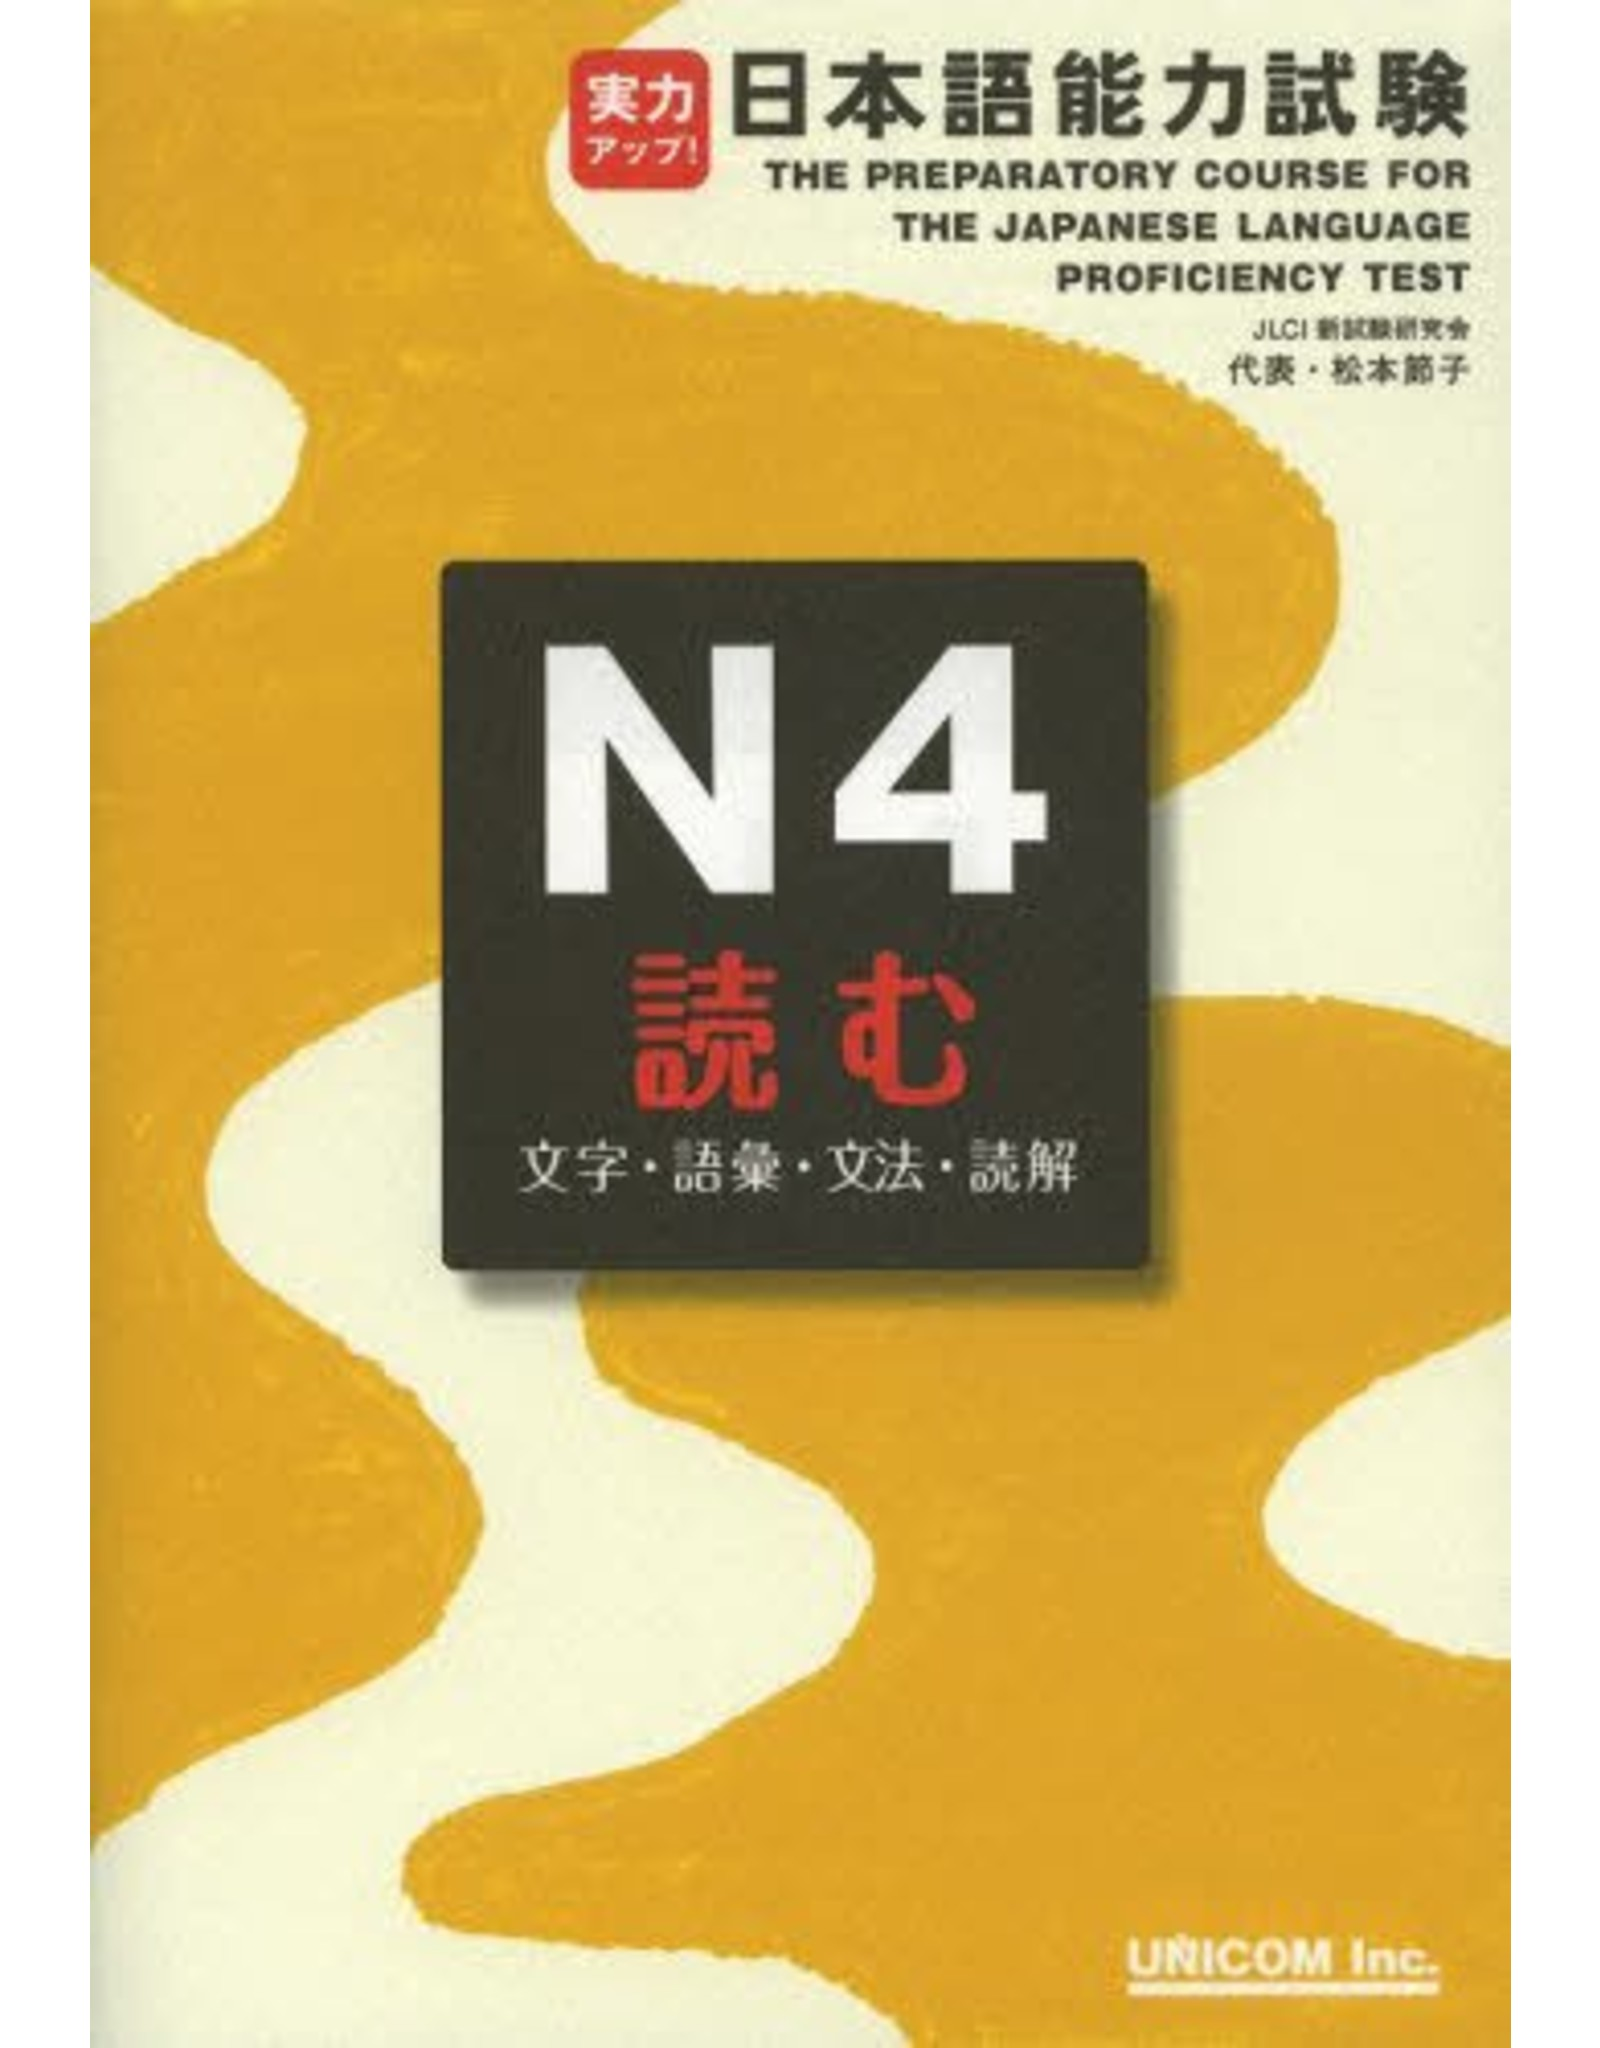 UNICOM THE PREPARATORY COURSE FOR THE JLPT N4 YOMU MOJI/GOI/BUNPO/DOKKAI